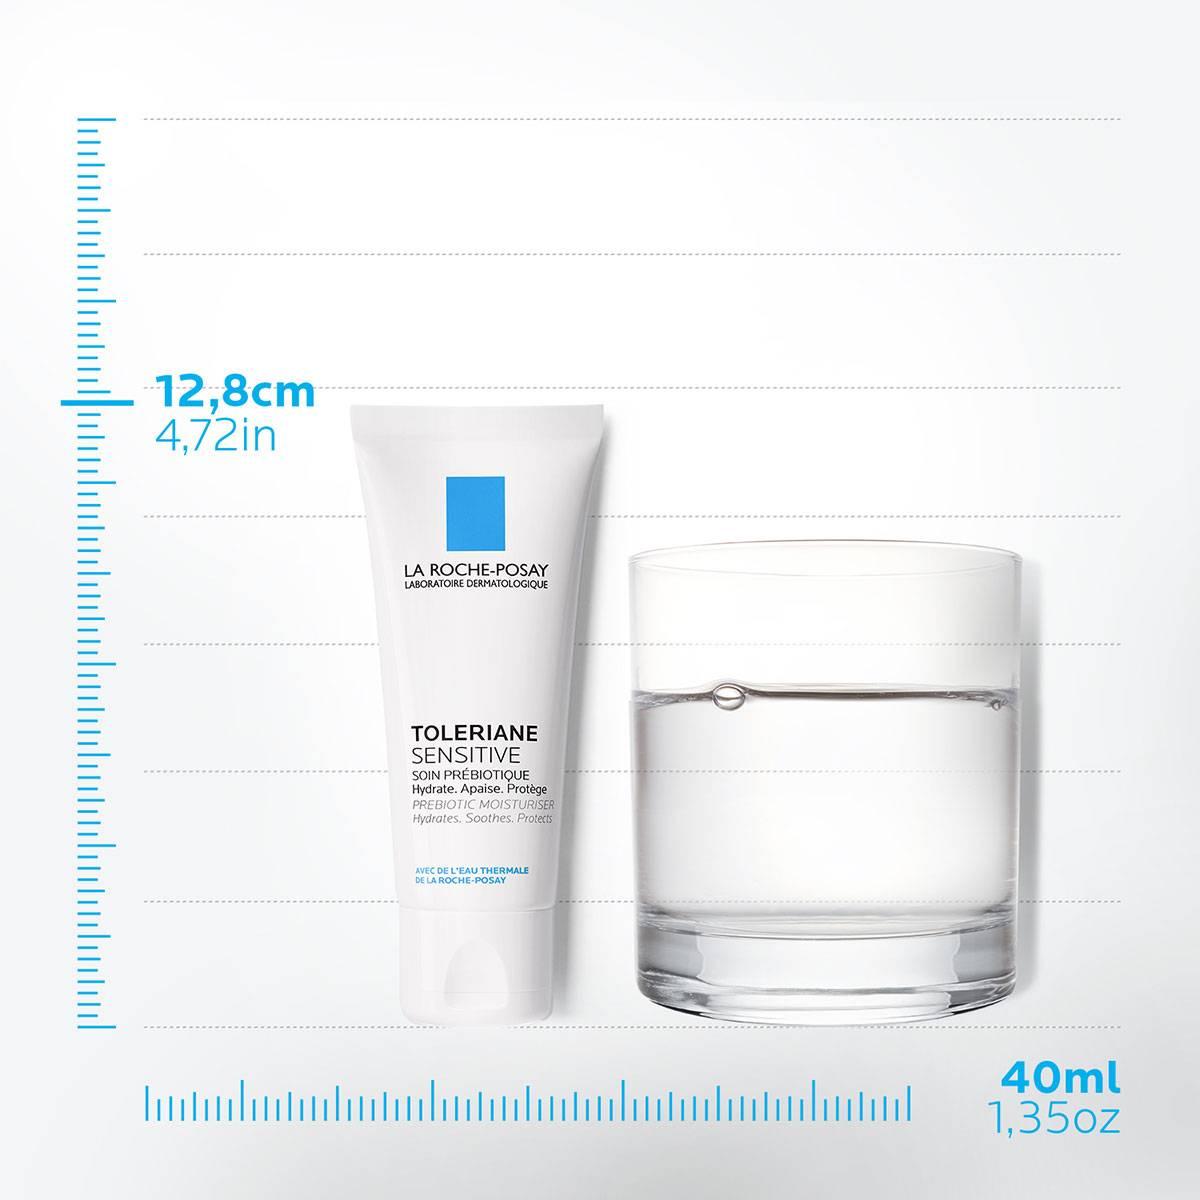 La Roche Posay ProduktSide Sensitiv Tendens til allergi Toleriane Præbiotisk Måned